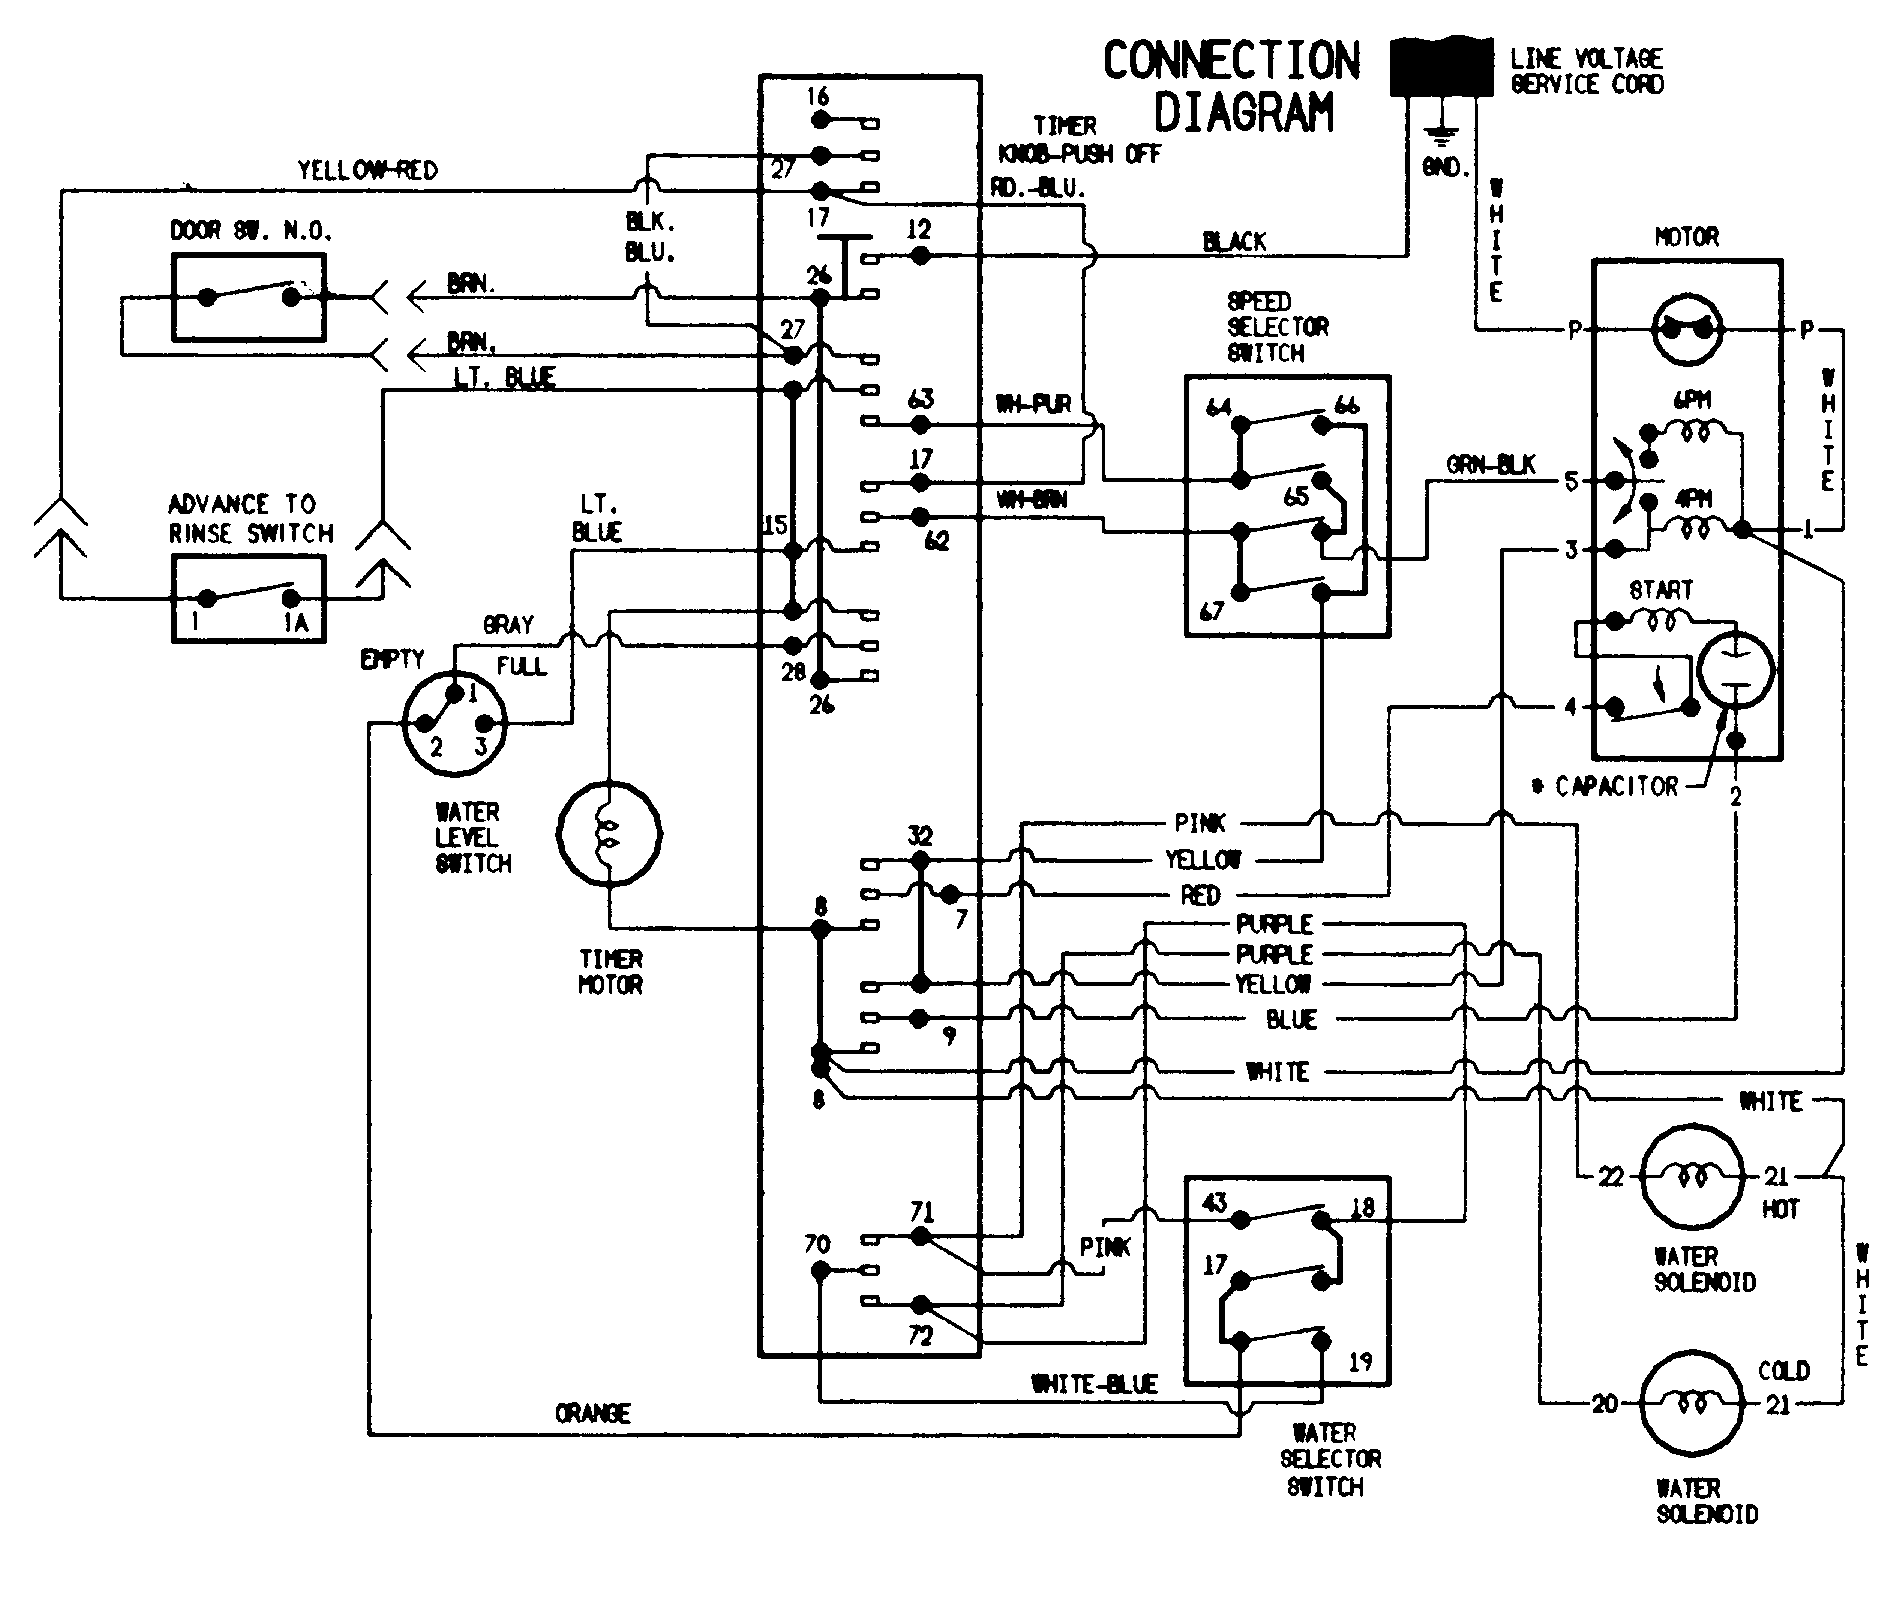 whirlpool tub wiring diagram